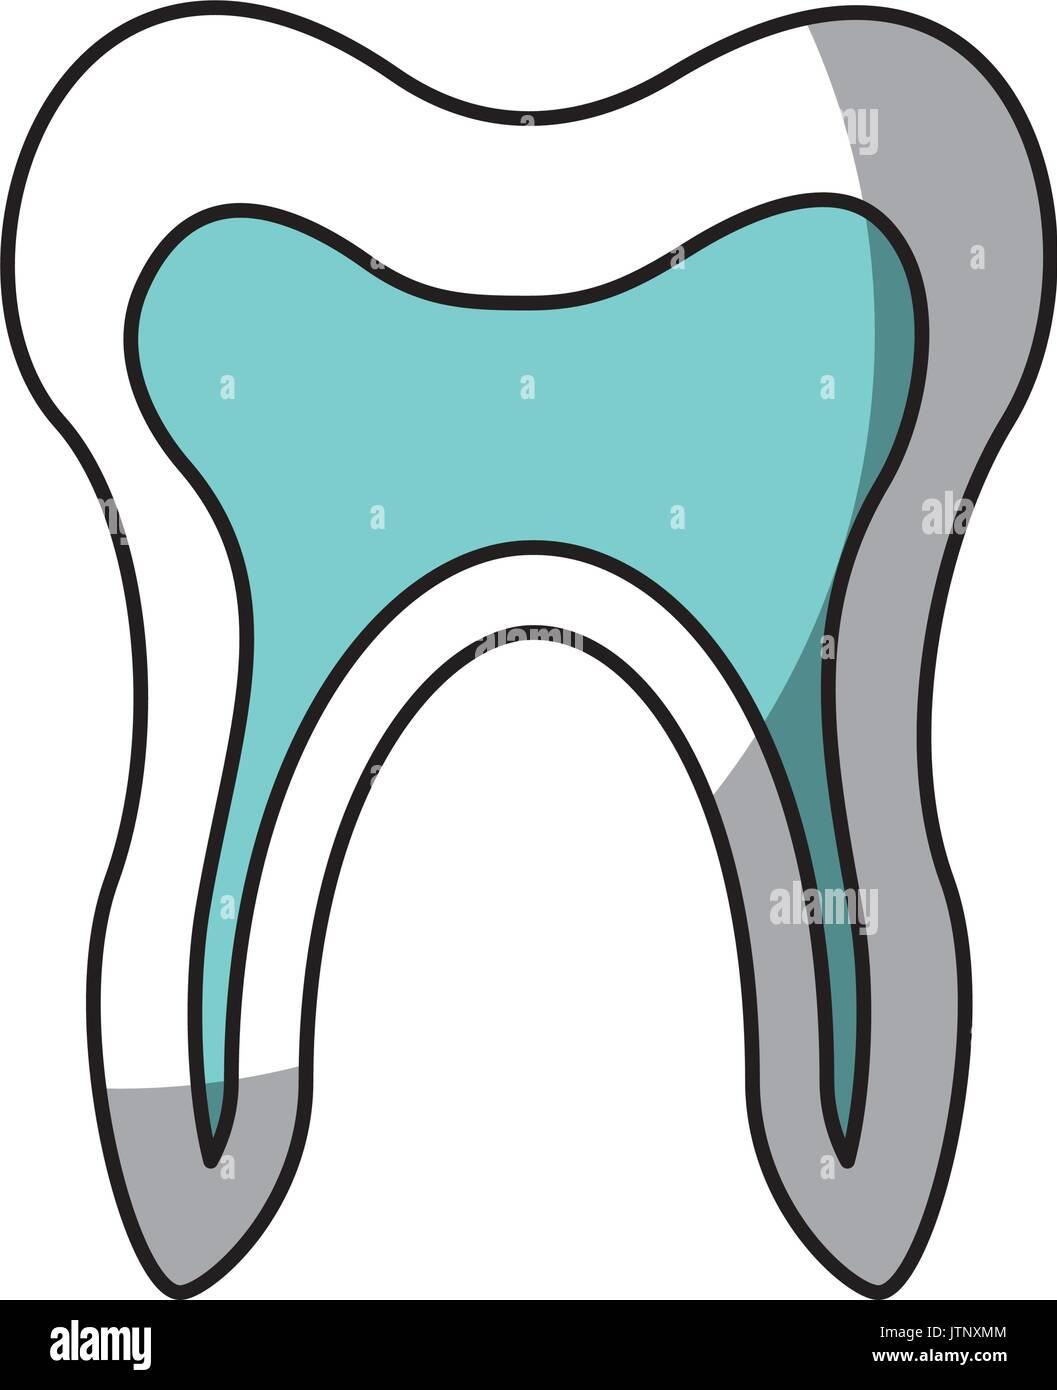 Tooth Symbol Stockfotos & Tooth Symbol Bilder - Seite 2 - Alamy